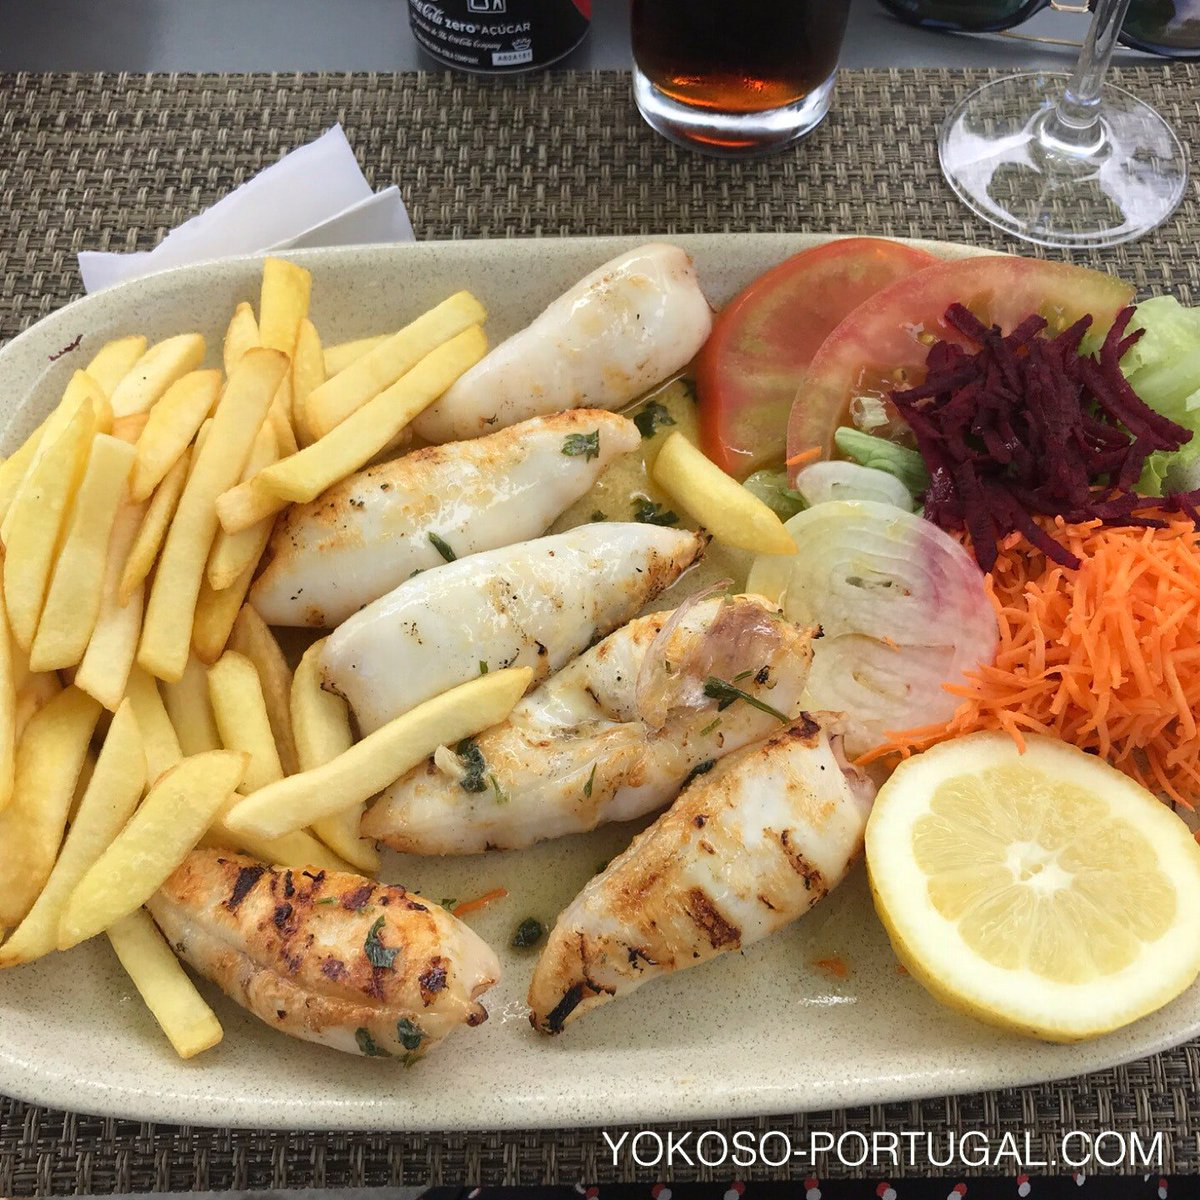 test ツイッターメディア - エストリルにあるビーチレストラン。海を眺めながらゆっくり食事が出来ます。 (@ Baiuka in Monte Estoril, Lisboa) https://t.co/w2Ekst5vUH https://t.co/K0ObSu668M